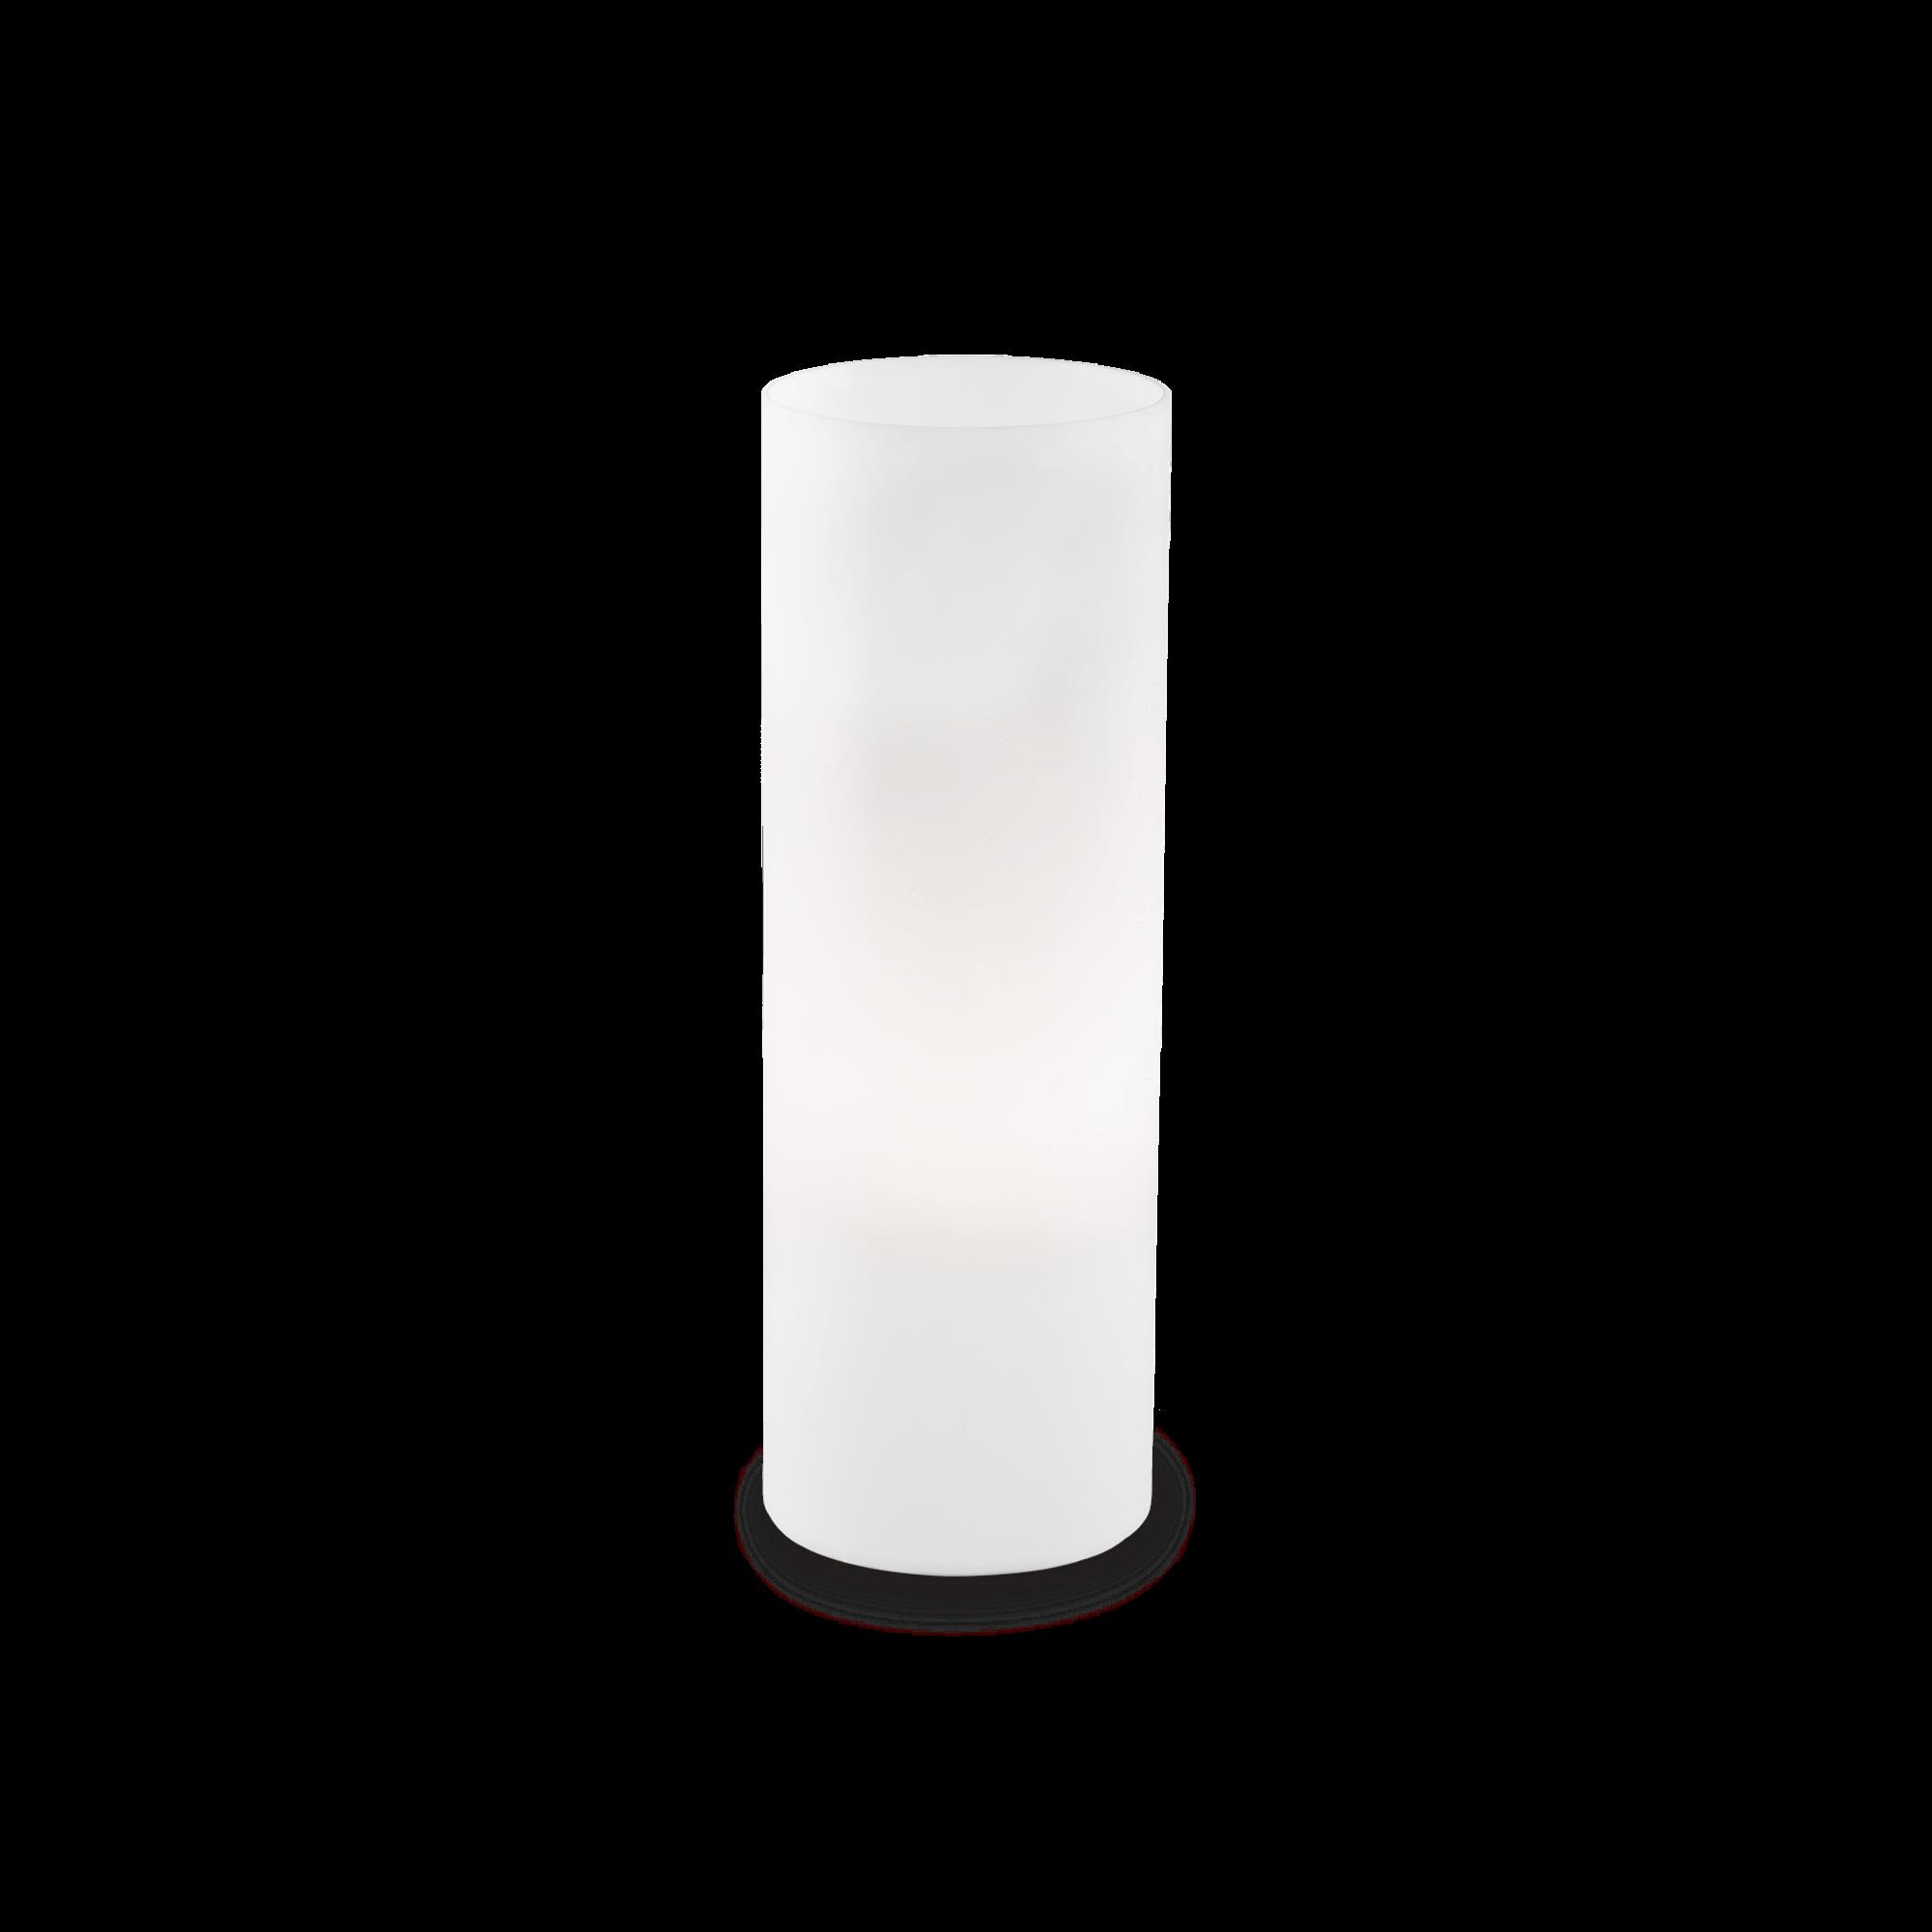 Ideal Lux 044590 Edo TL1 Big asztali lámpa